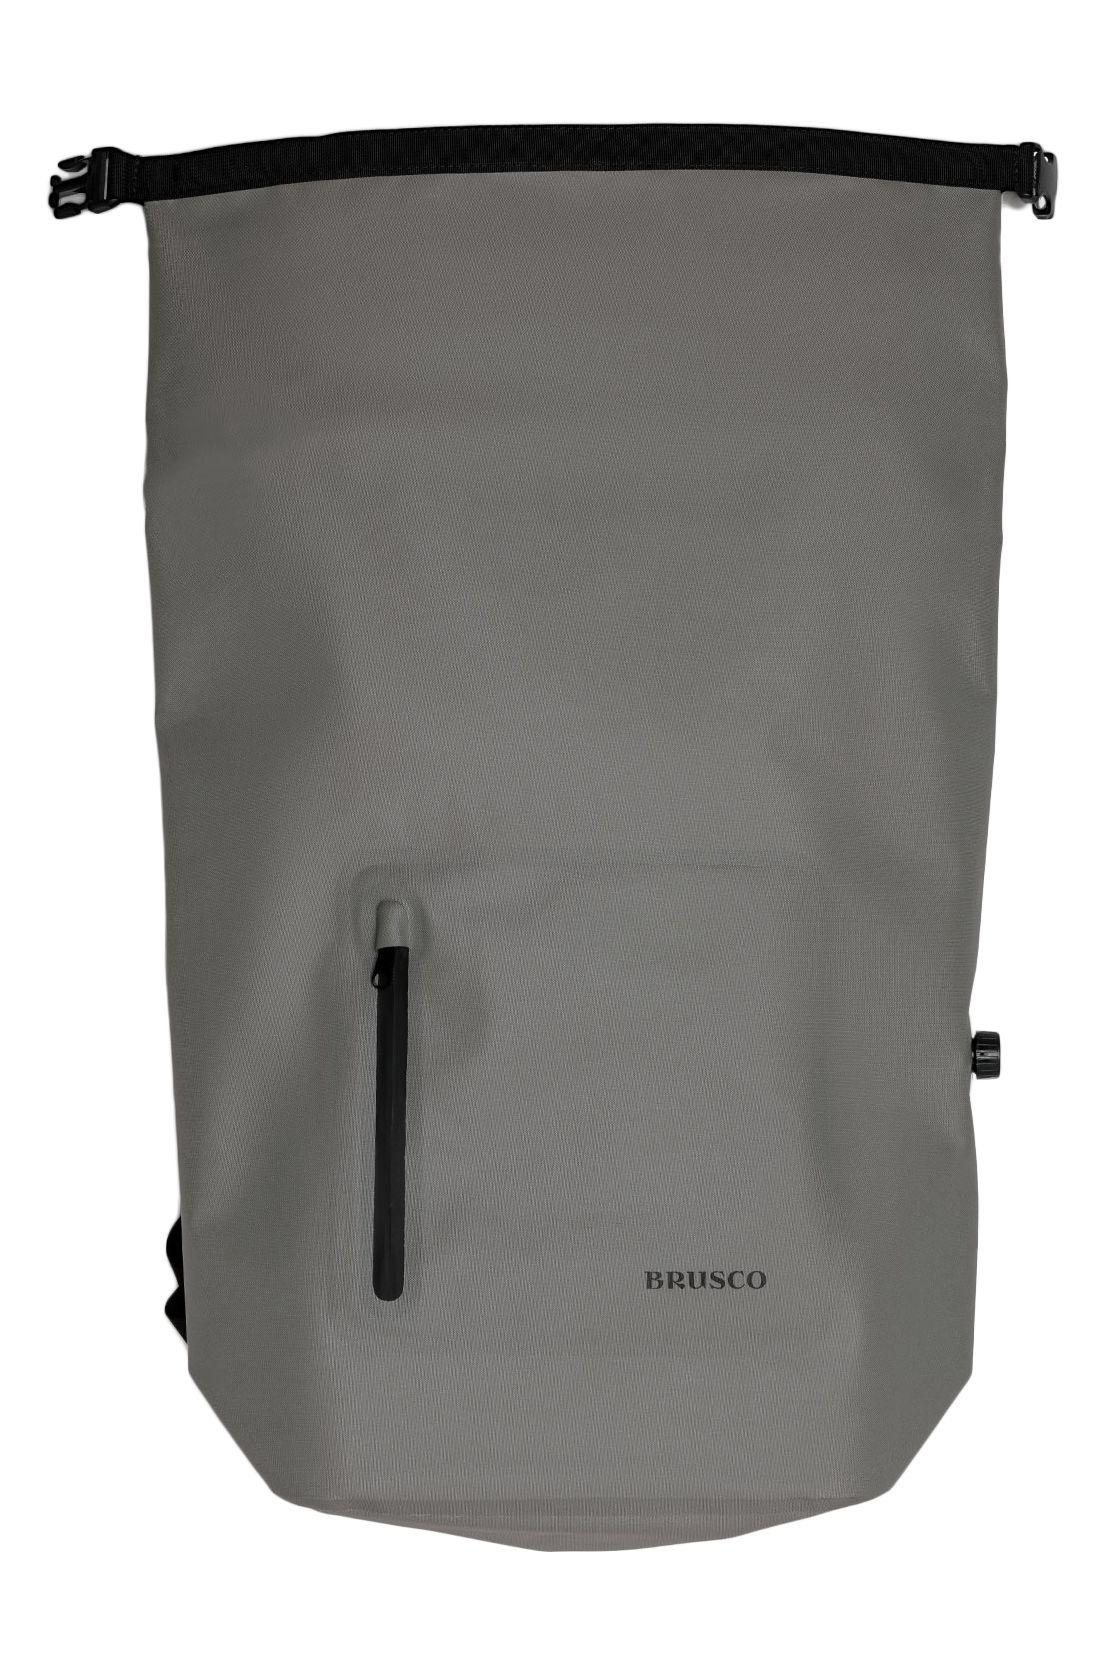 Brusco Bag STORM GRAY DRY BAG Storm Gray